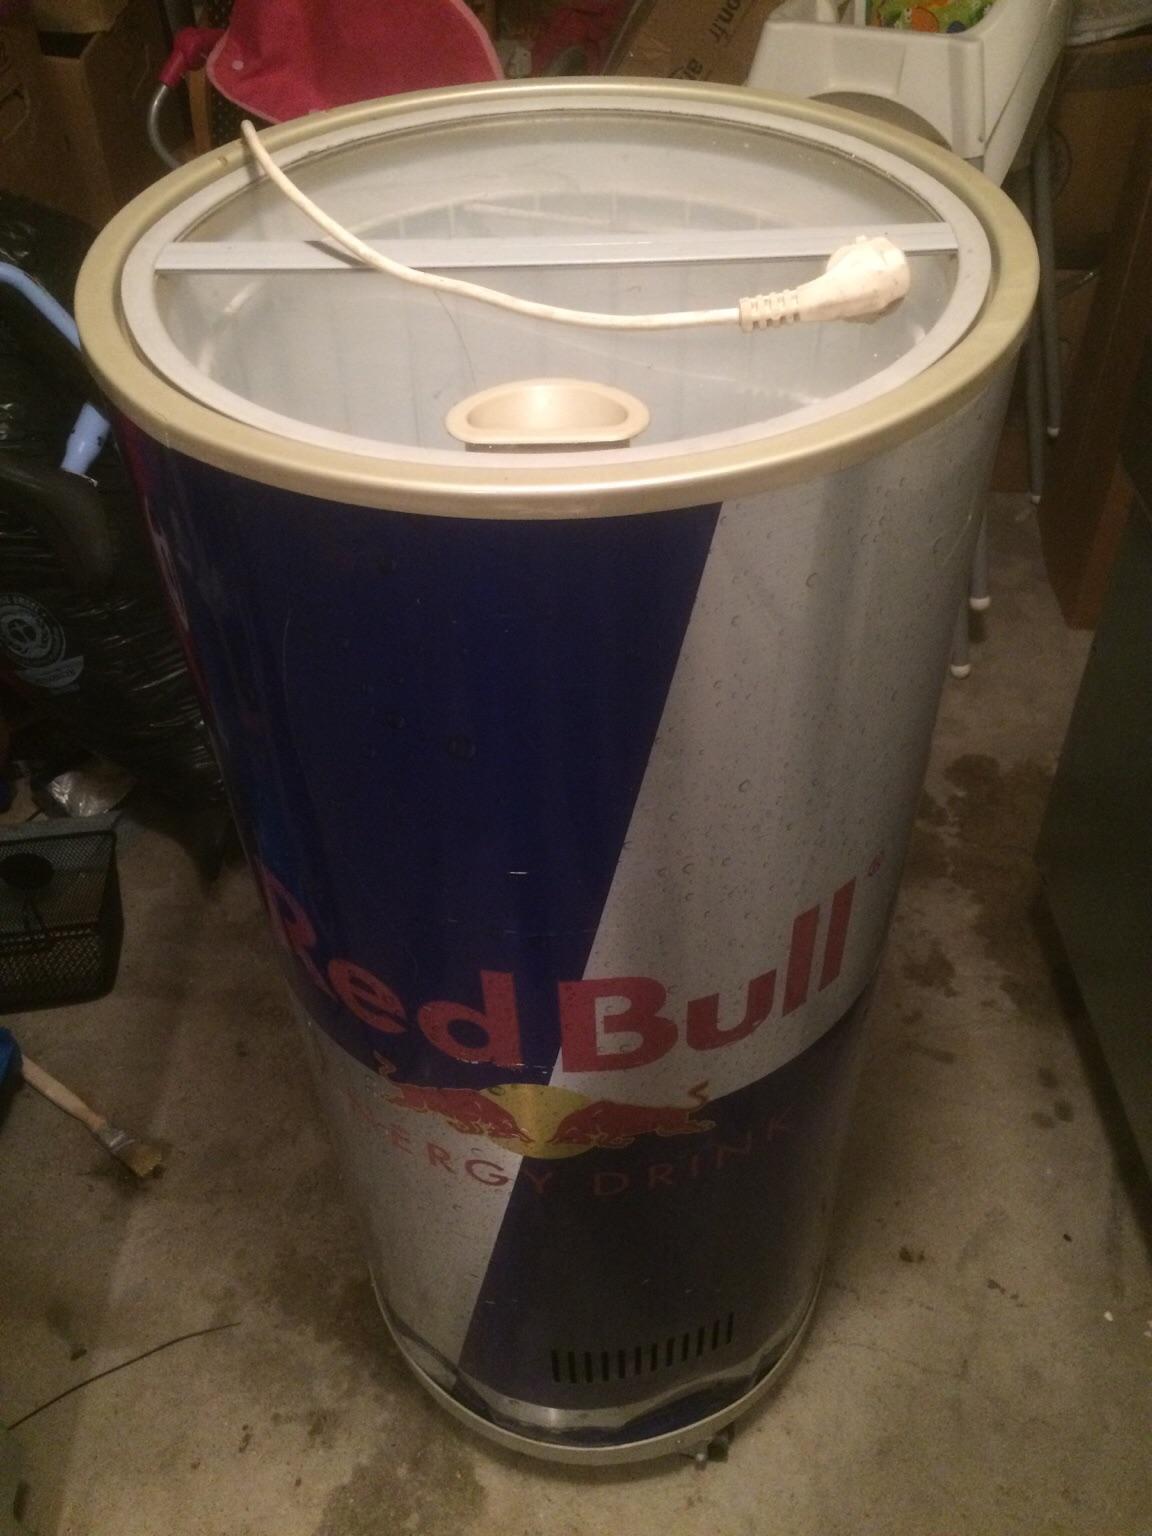 Red Bull Kühlschrank Tonne : Gebraucht red bull tonne kühlschrank in glinde um u ac